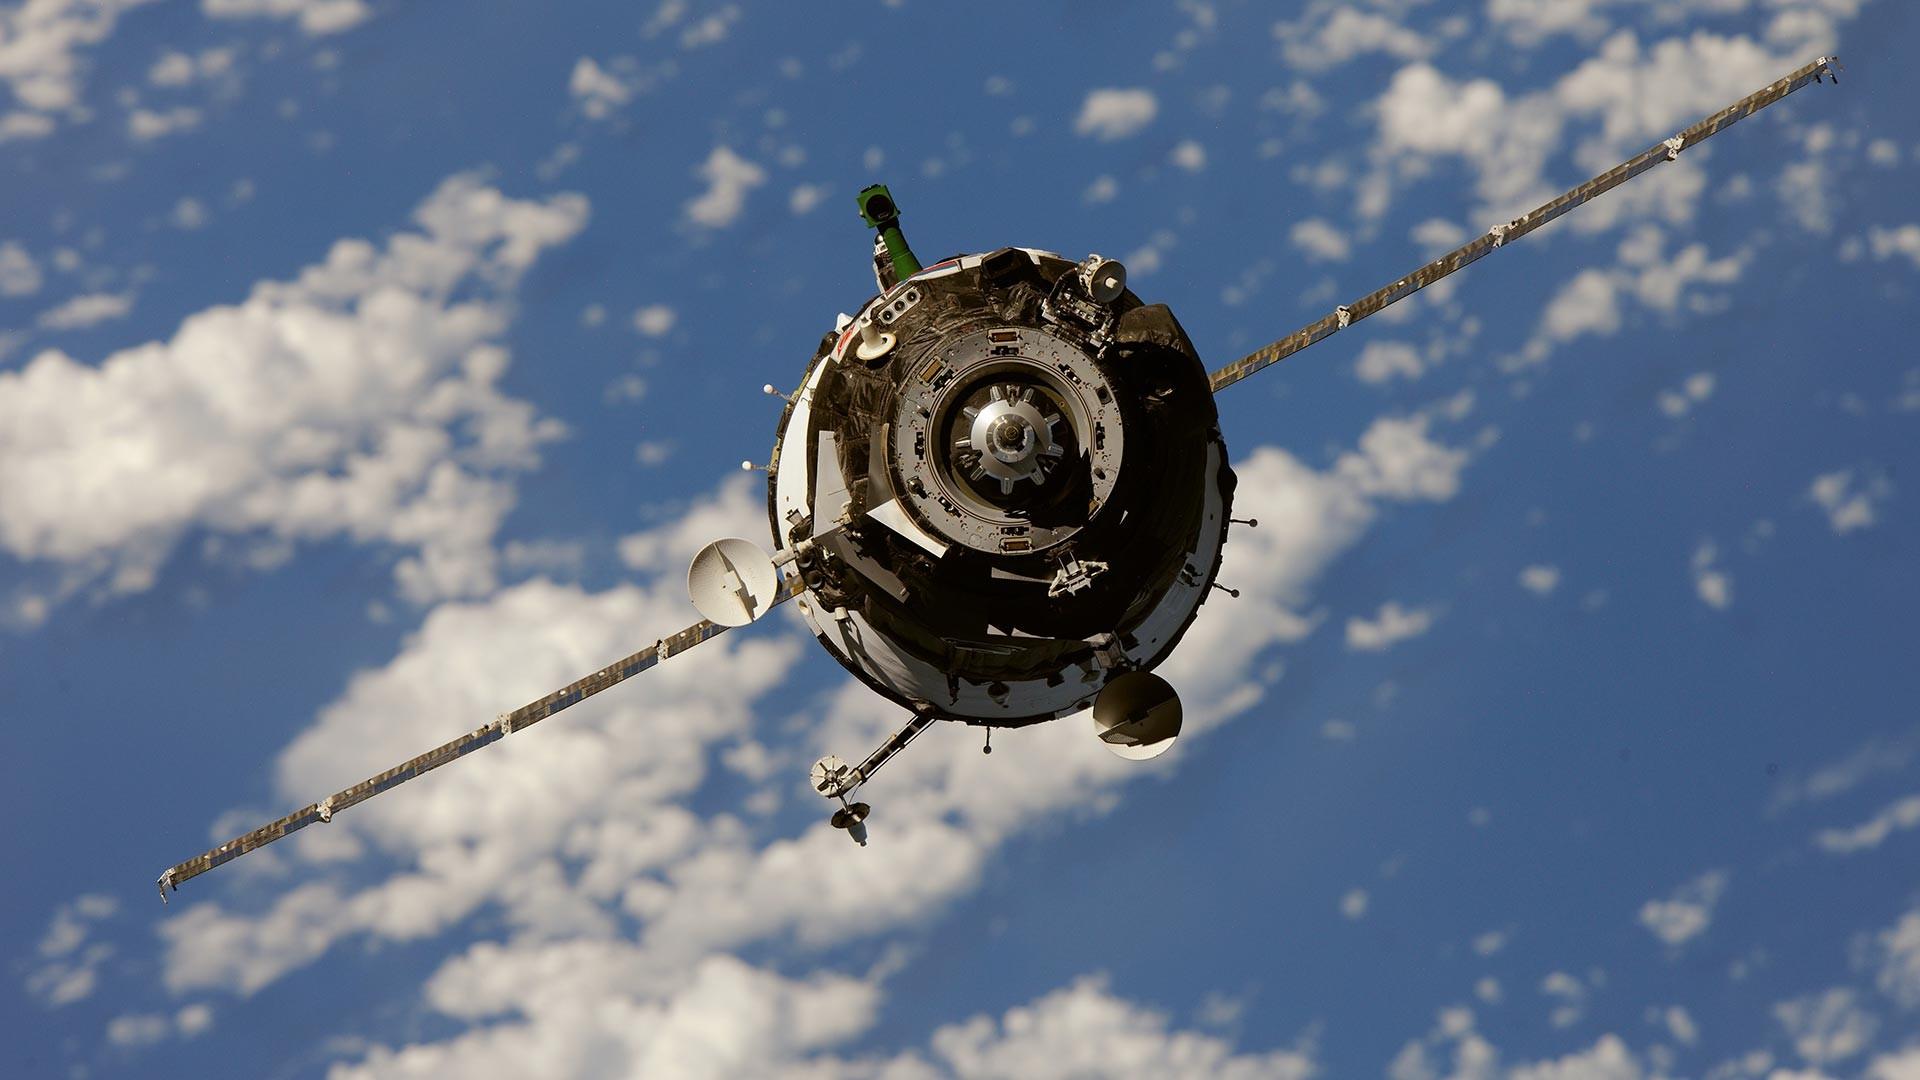 Sojuz TMA-01M